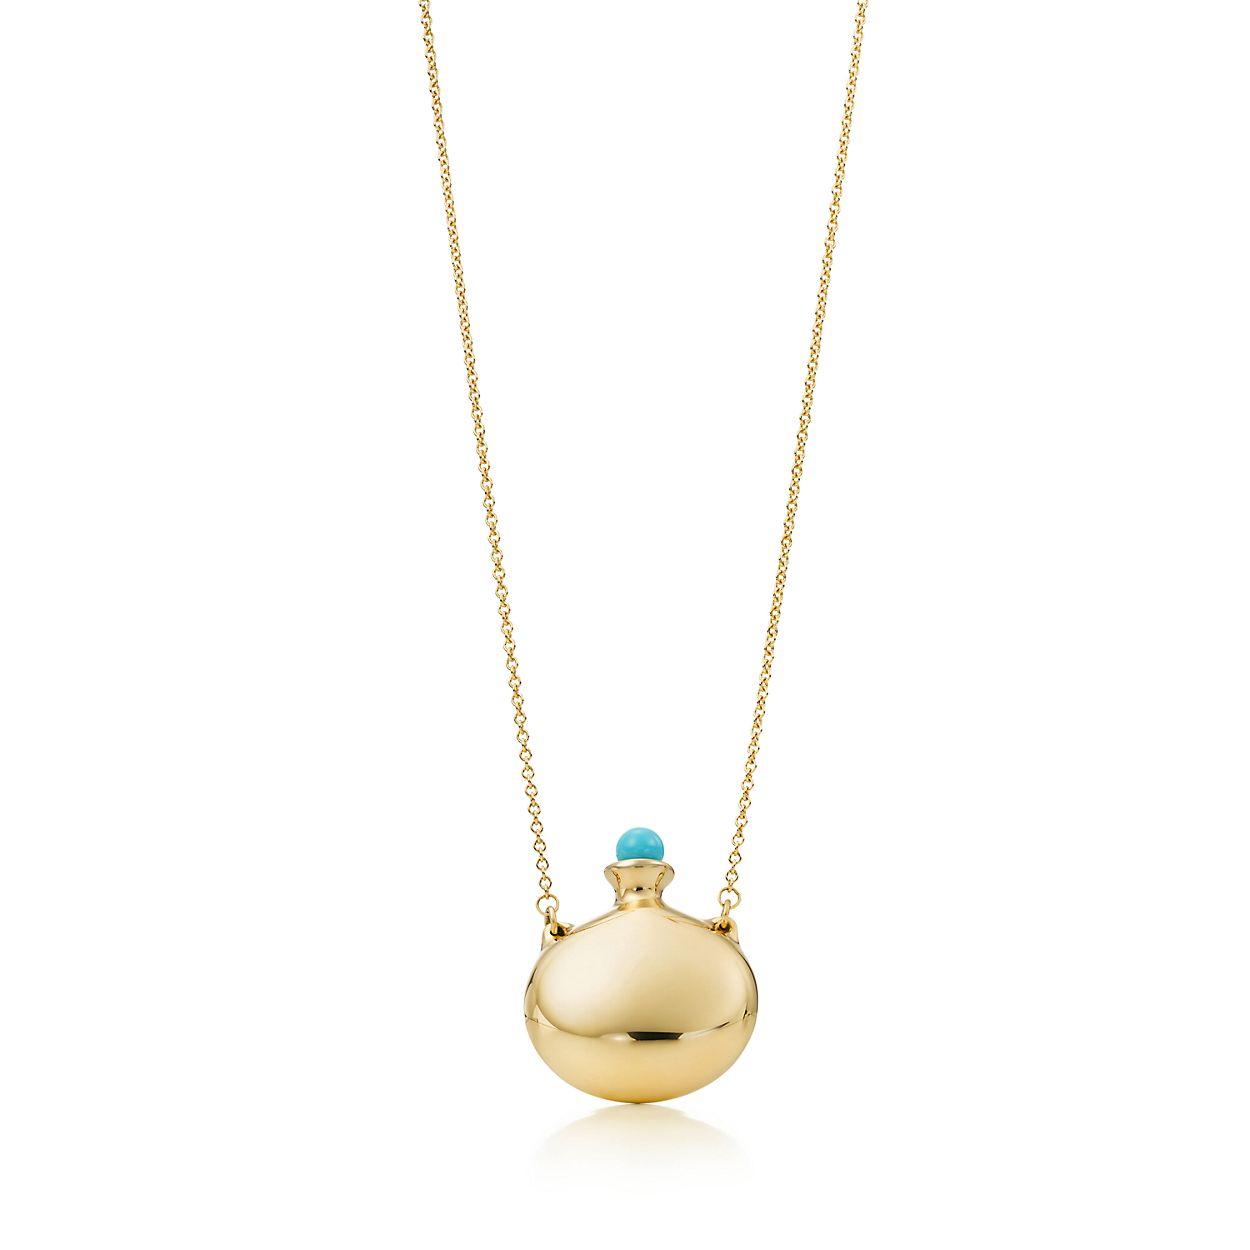 Elsa Peretti Open Heart pendant of turquoise and 18k gold Tiffany & Co. bLfnaI